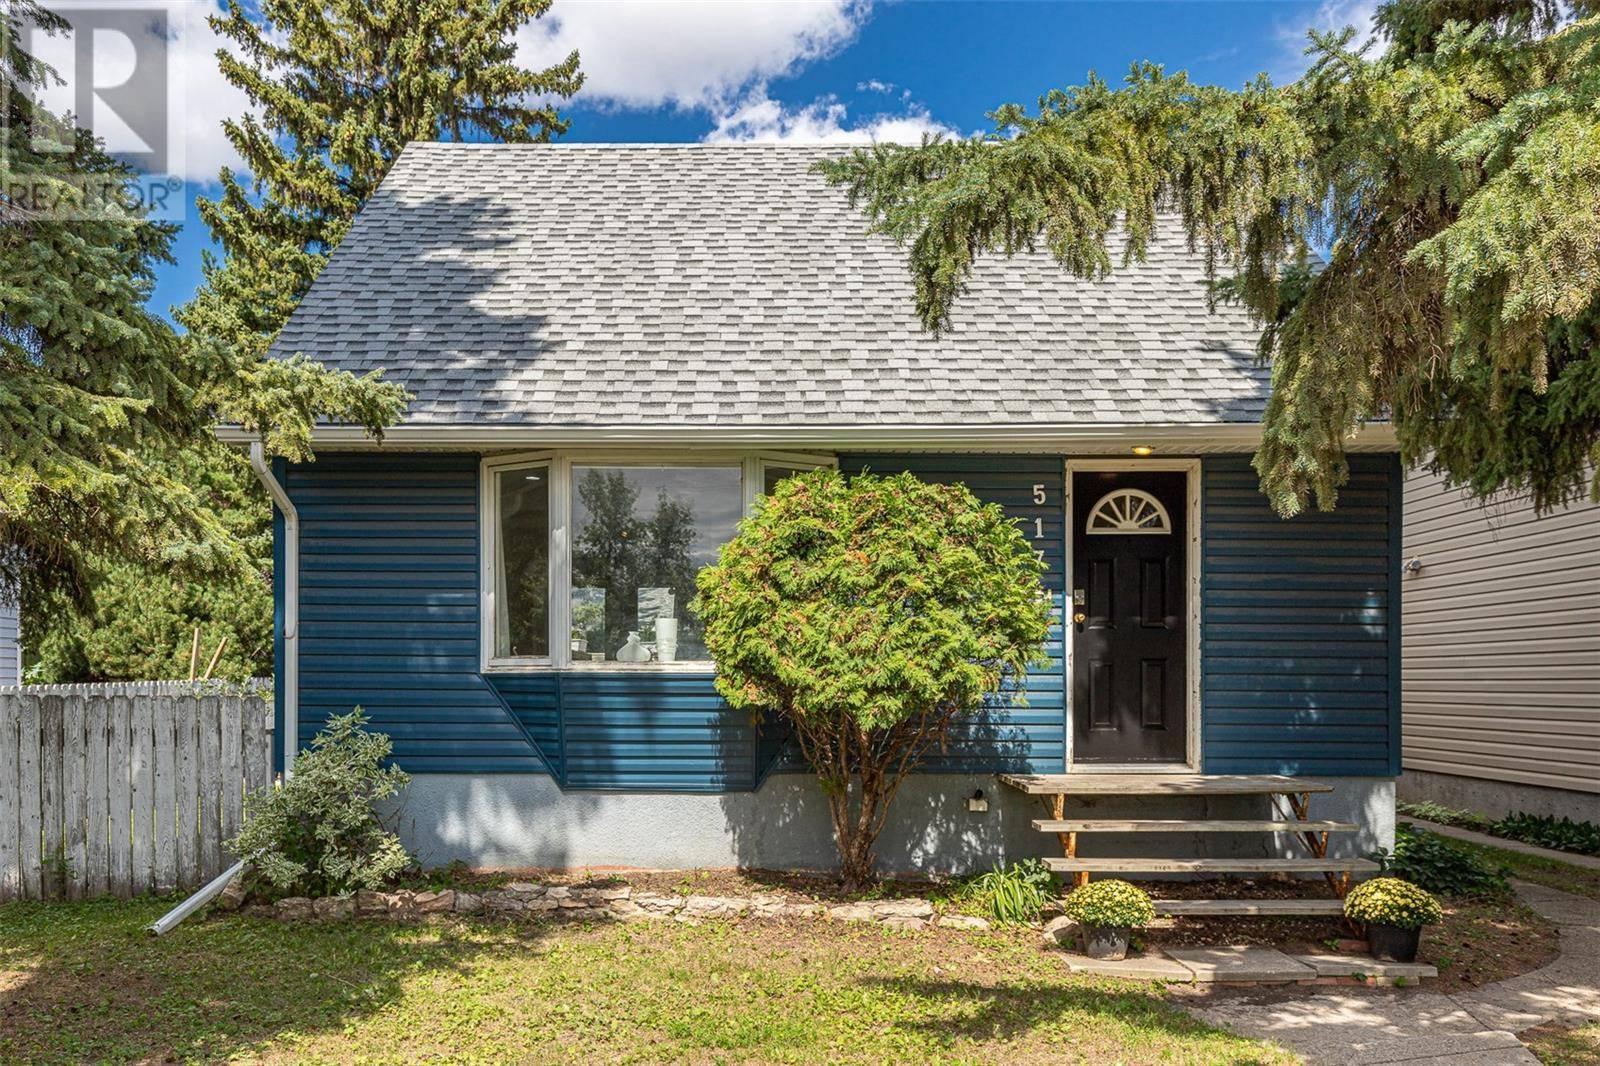 House for sale at 517 Taylor St E Saskatoon Saskatchewan - MLS: SK783661